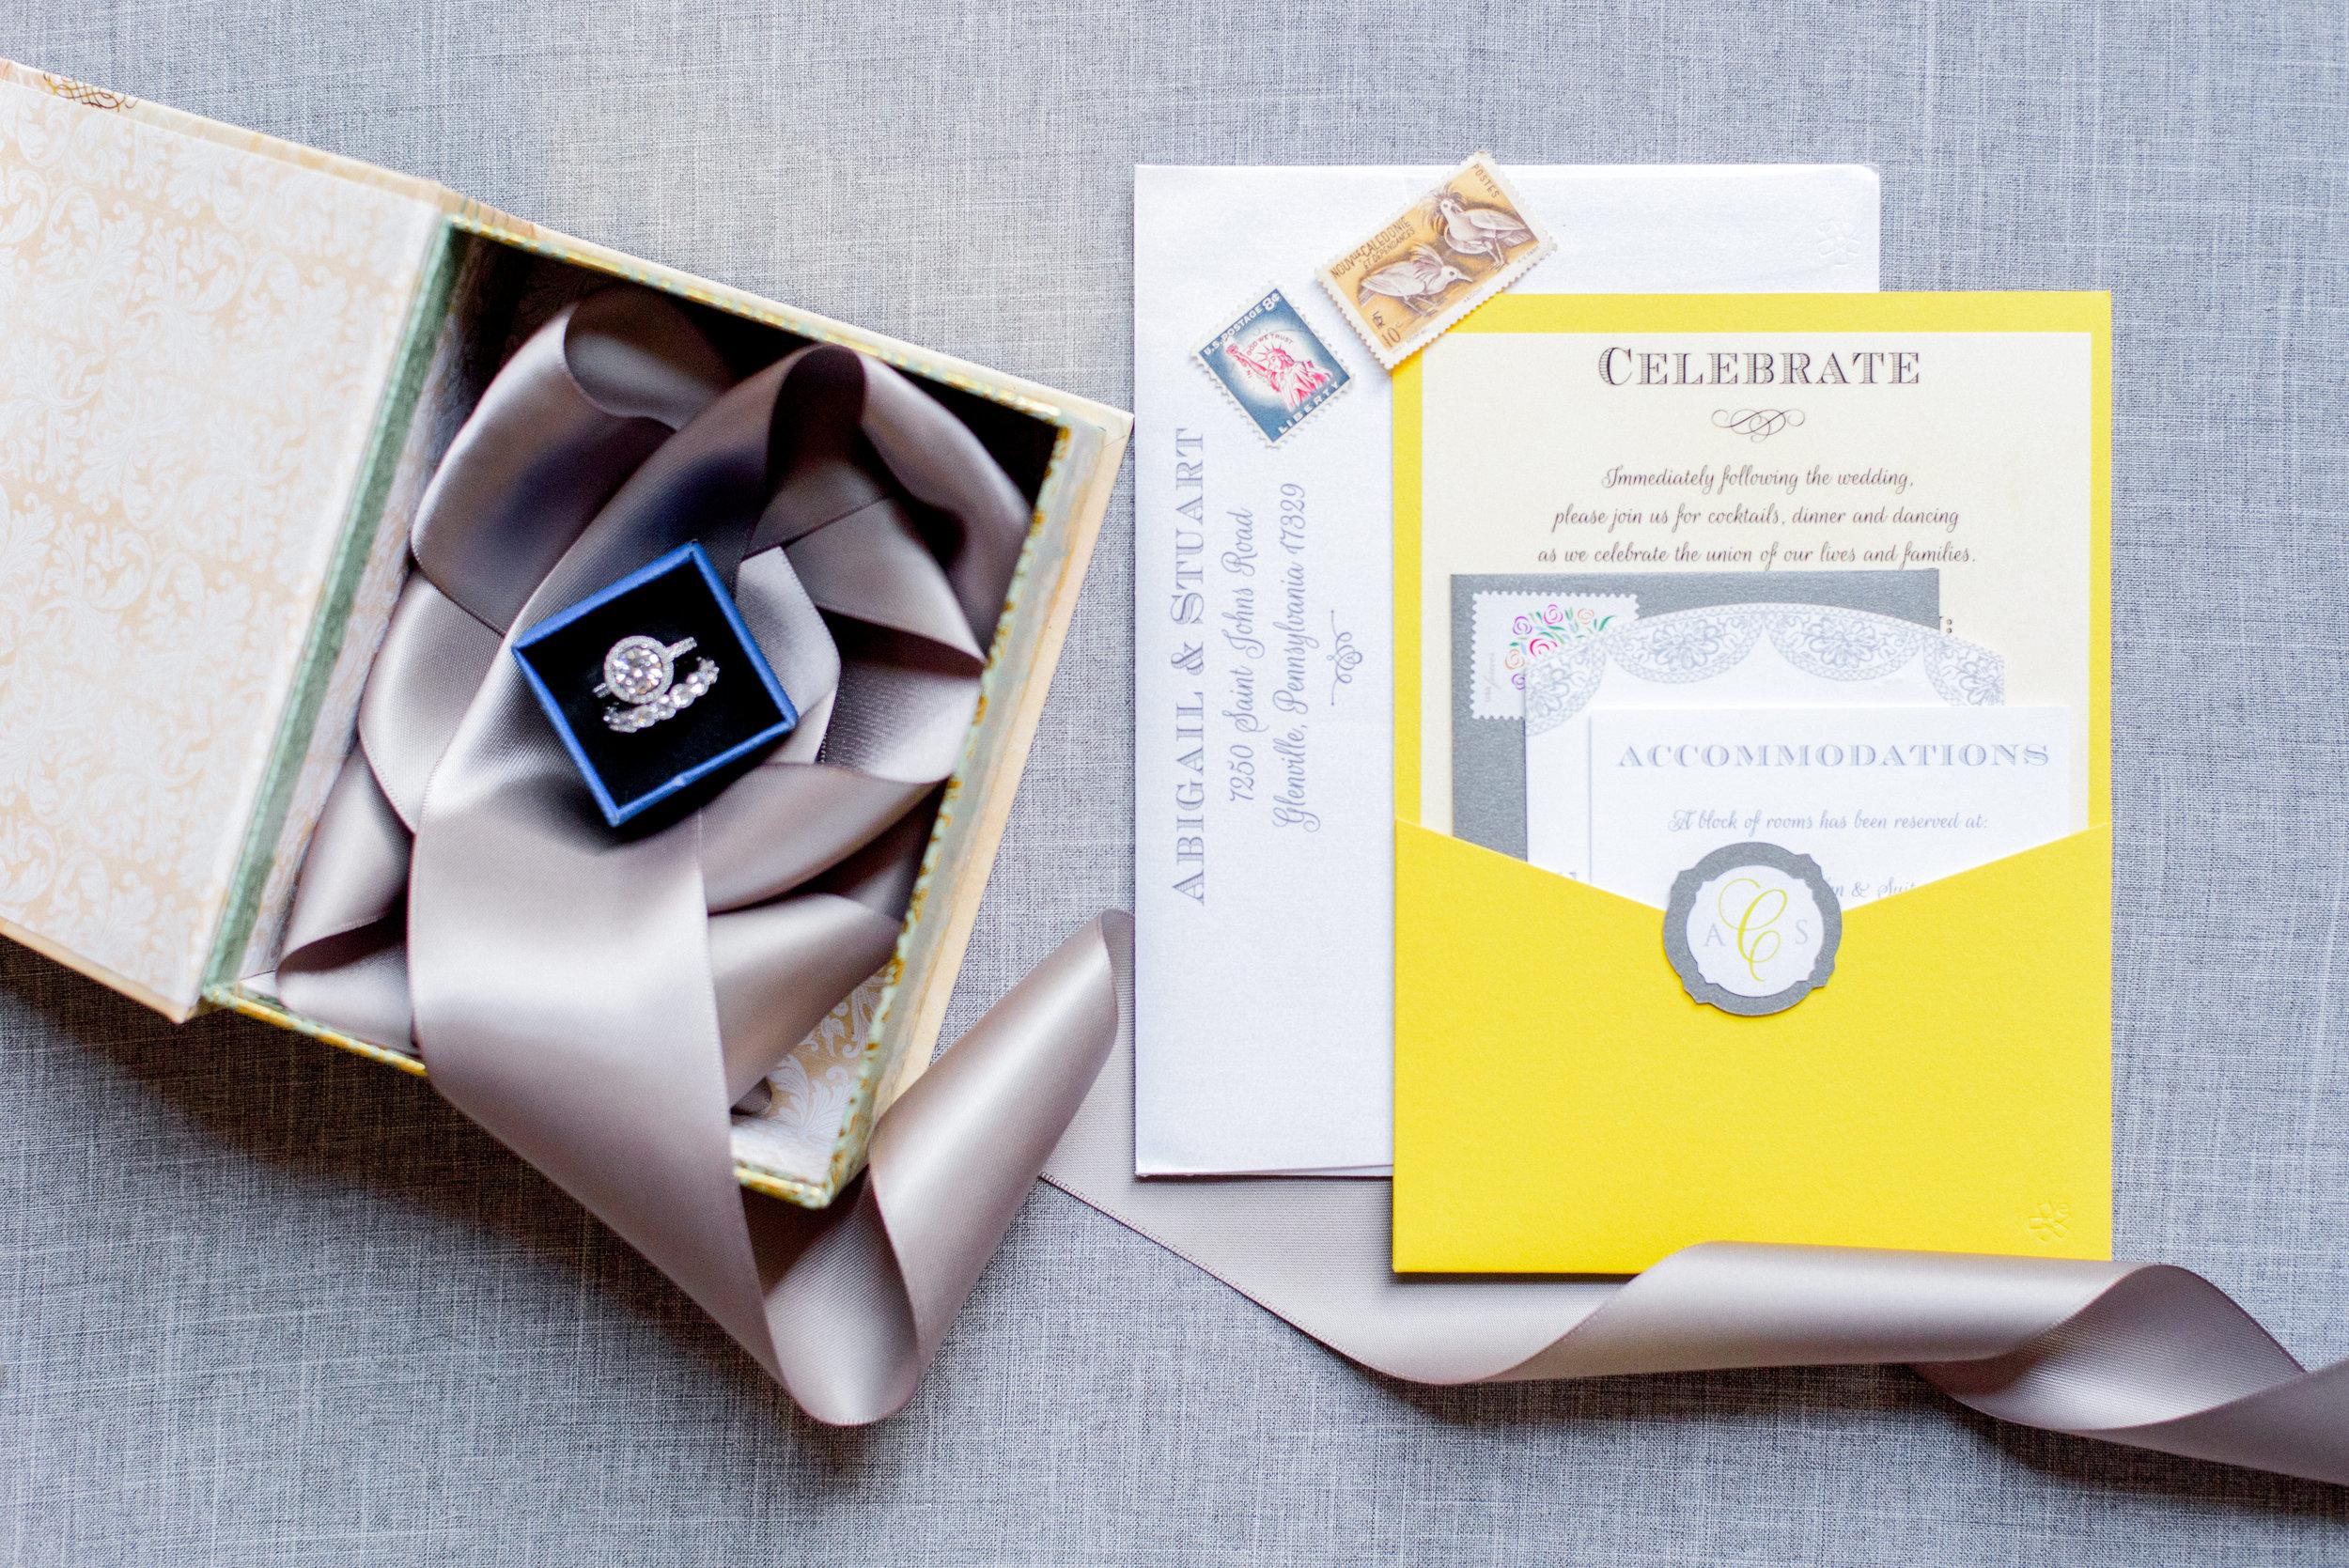 Yellow Central PA, York PA, JesSmith Designs, custom, wedding, invitations, bridal, announcements, save the date, baby, hanover, calligraphy, baltimore, wedding invitations, lancaster, gettysburg Gray-0037.jpg